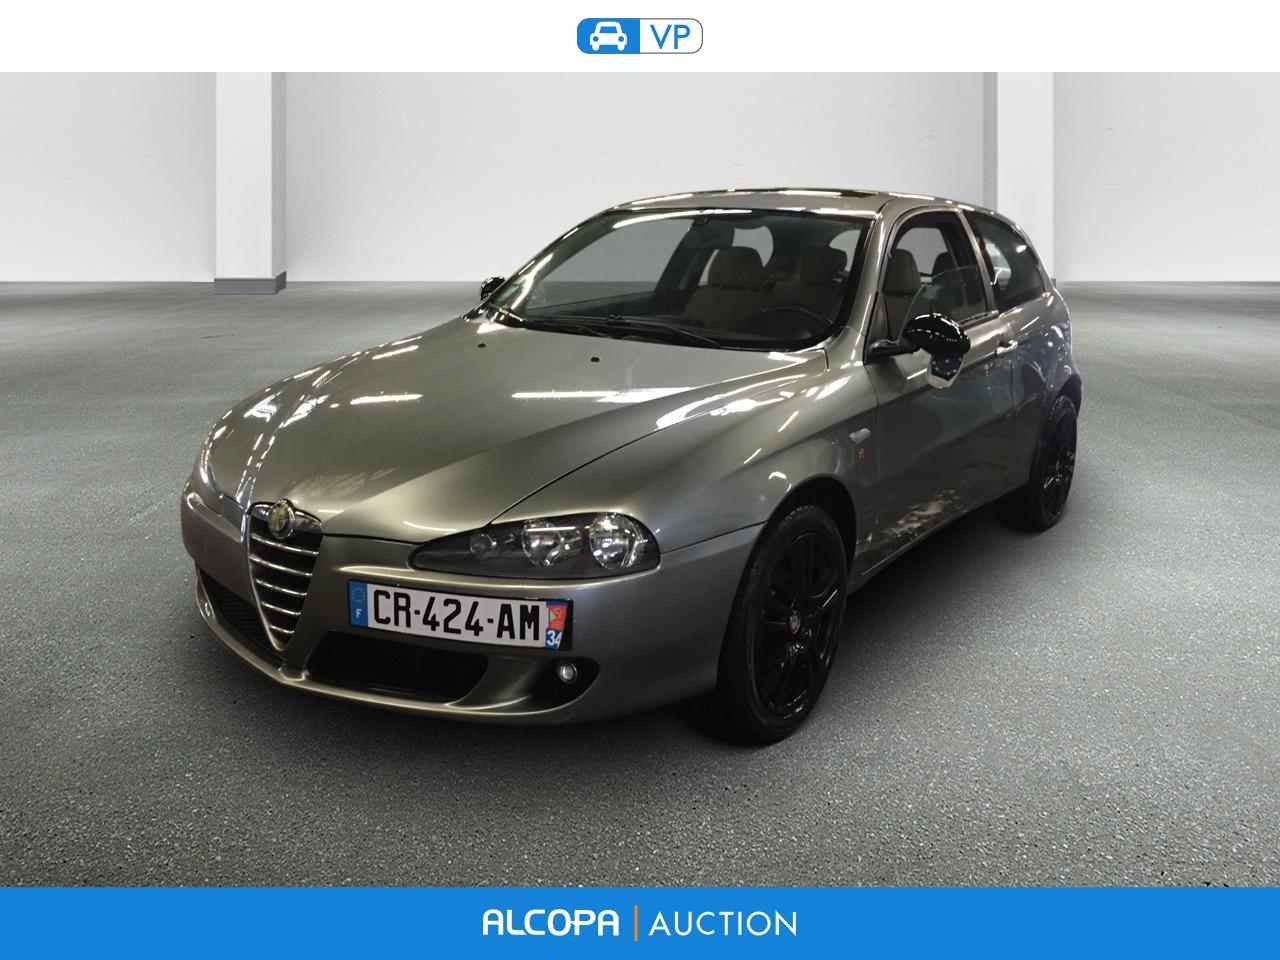 Alfa Romeo 147 09 2006 06 2010 147 1 9 Jtd M Jet 120 Design Ti Alcopa Auction